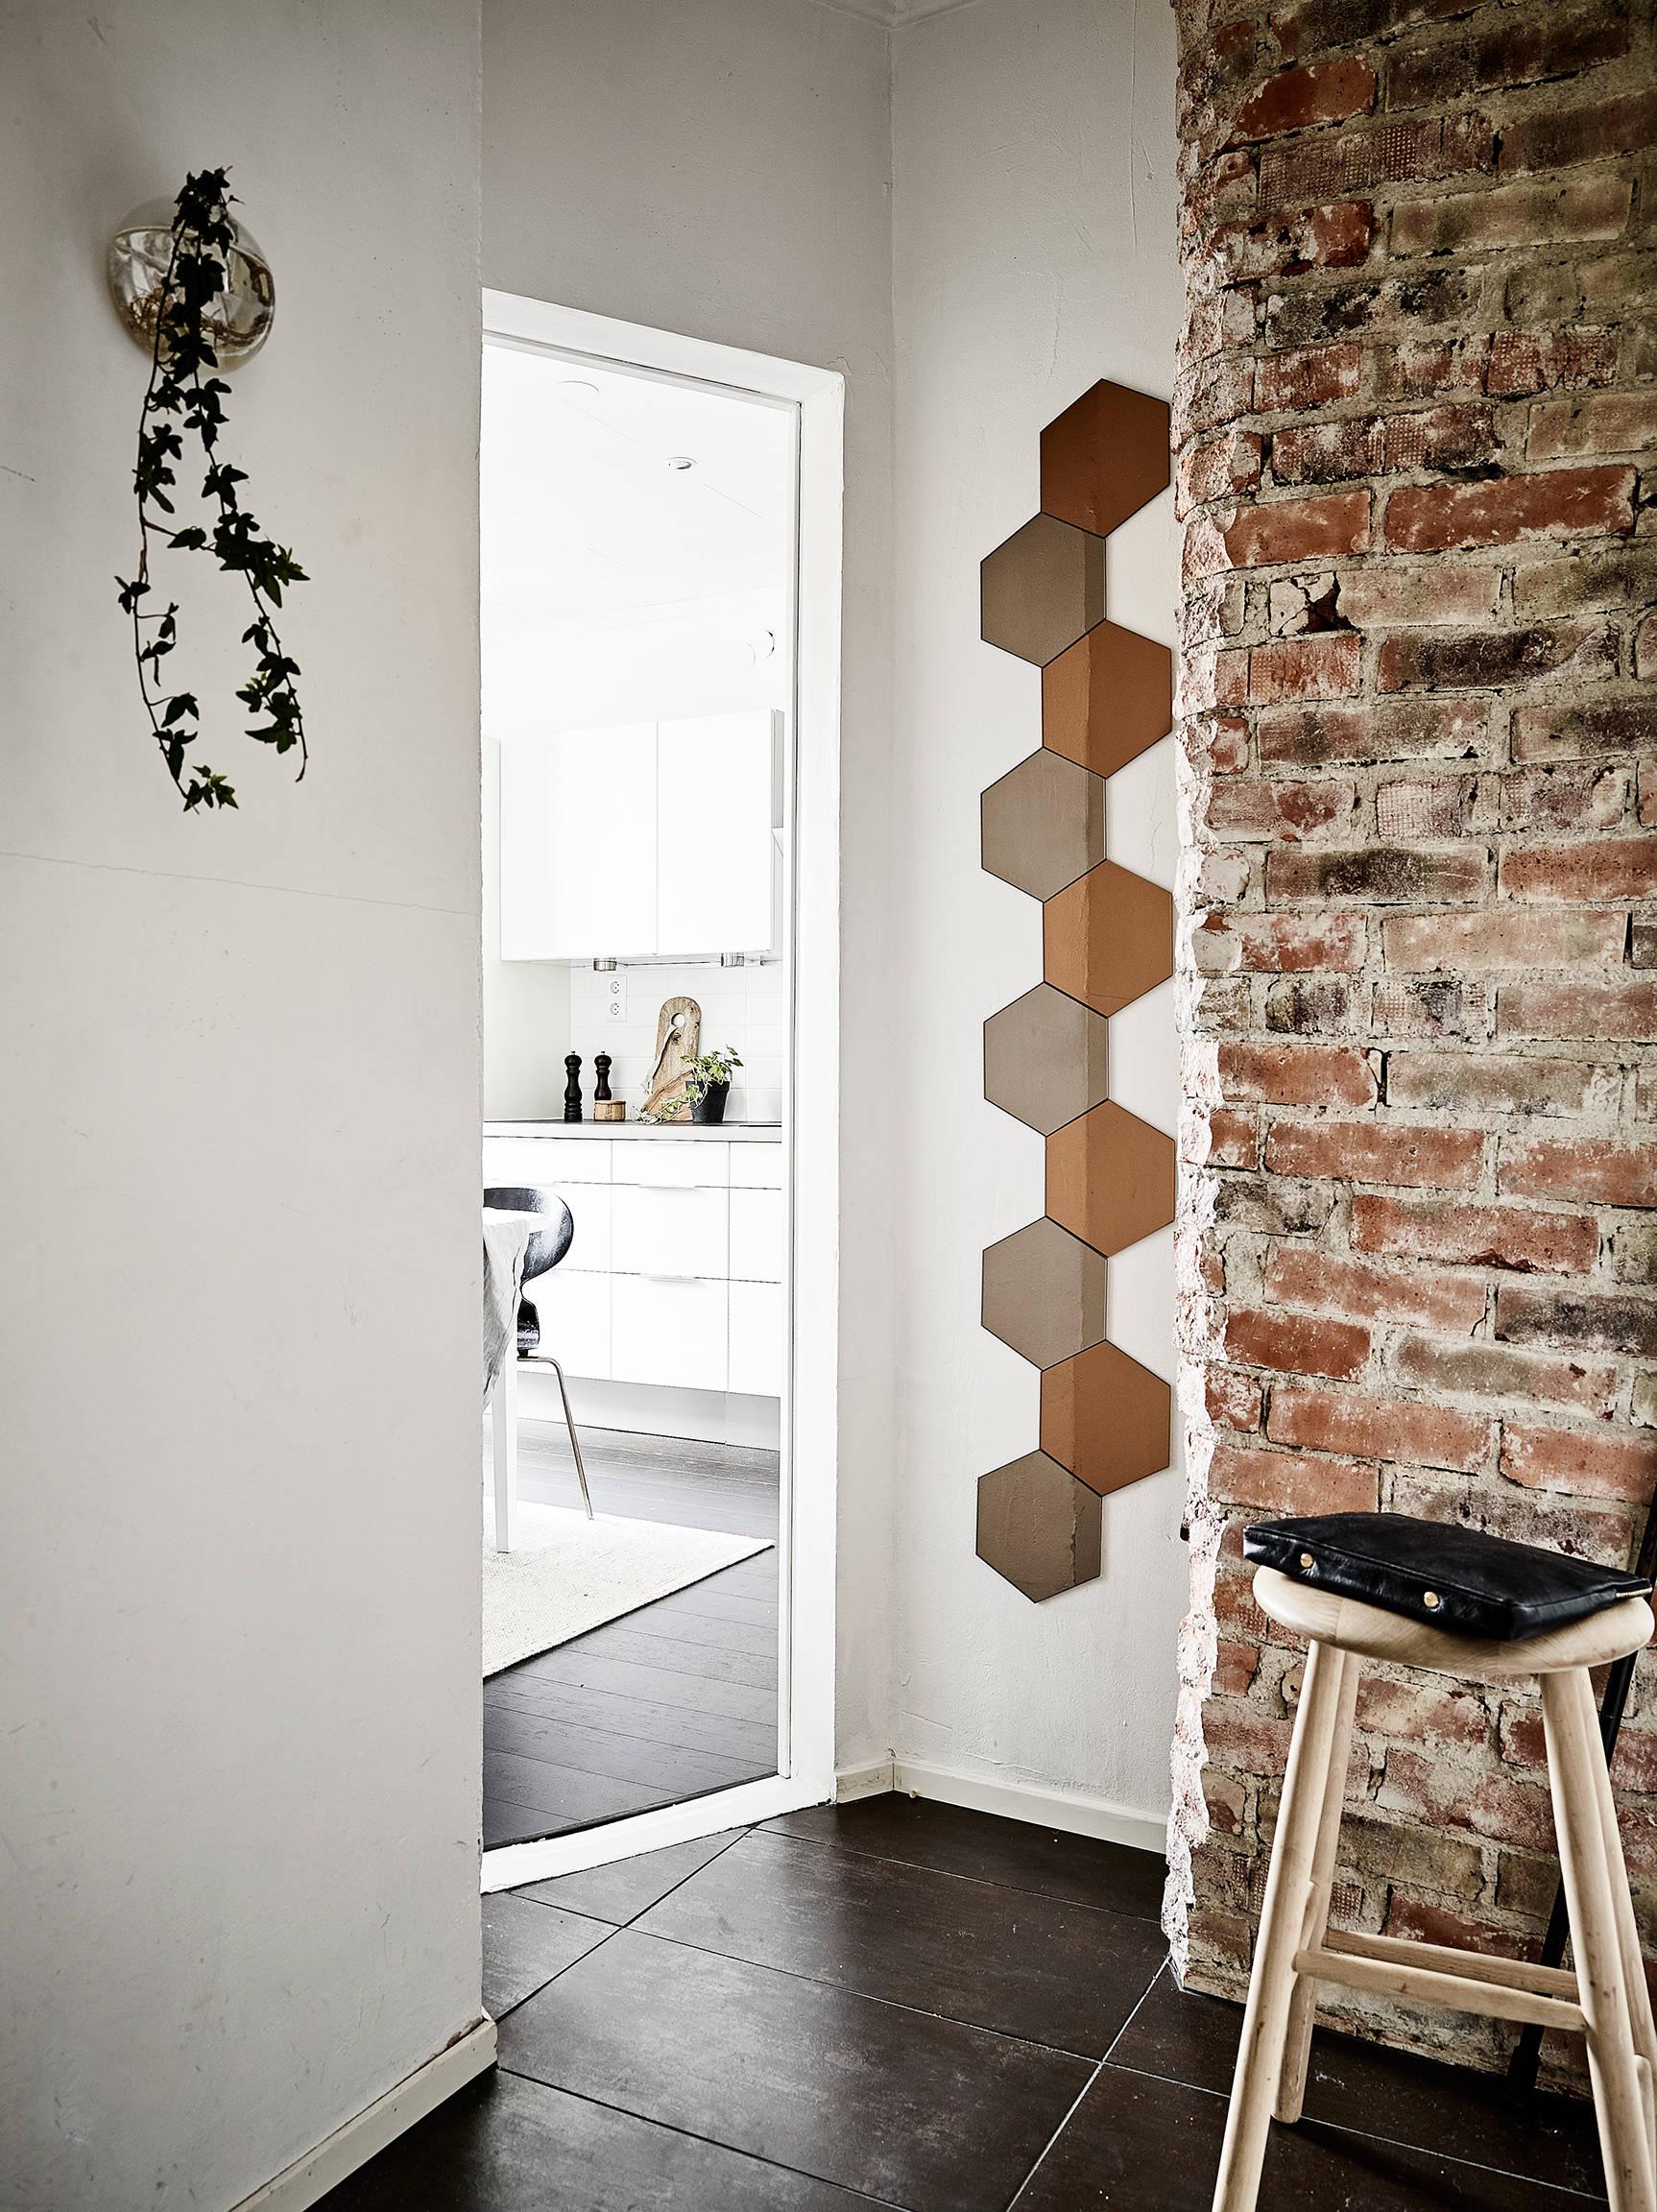 Decoracion paredes con papel papel pintado floral papel - Papel para decorar paredes ...